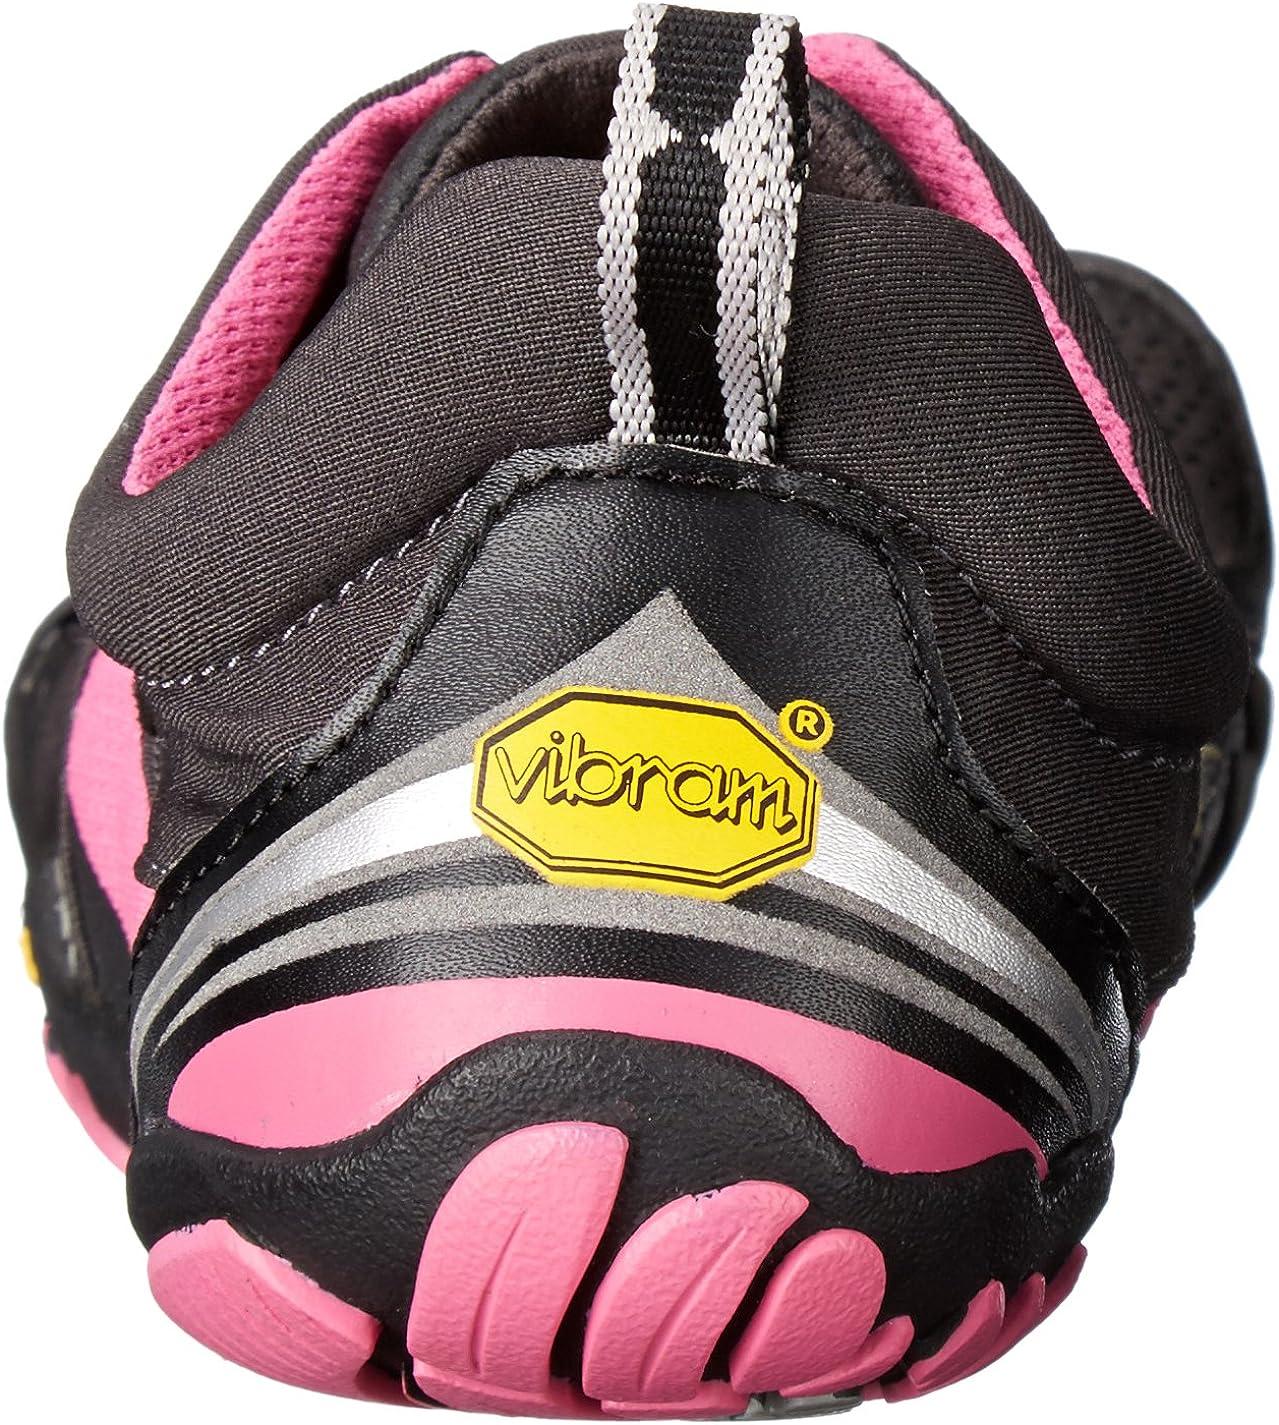 Vibram Five Fingers KMD Sport LS, Scarpe da Arrampicata Donna Nero Black Grey Black Pink